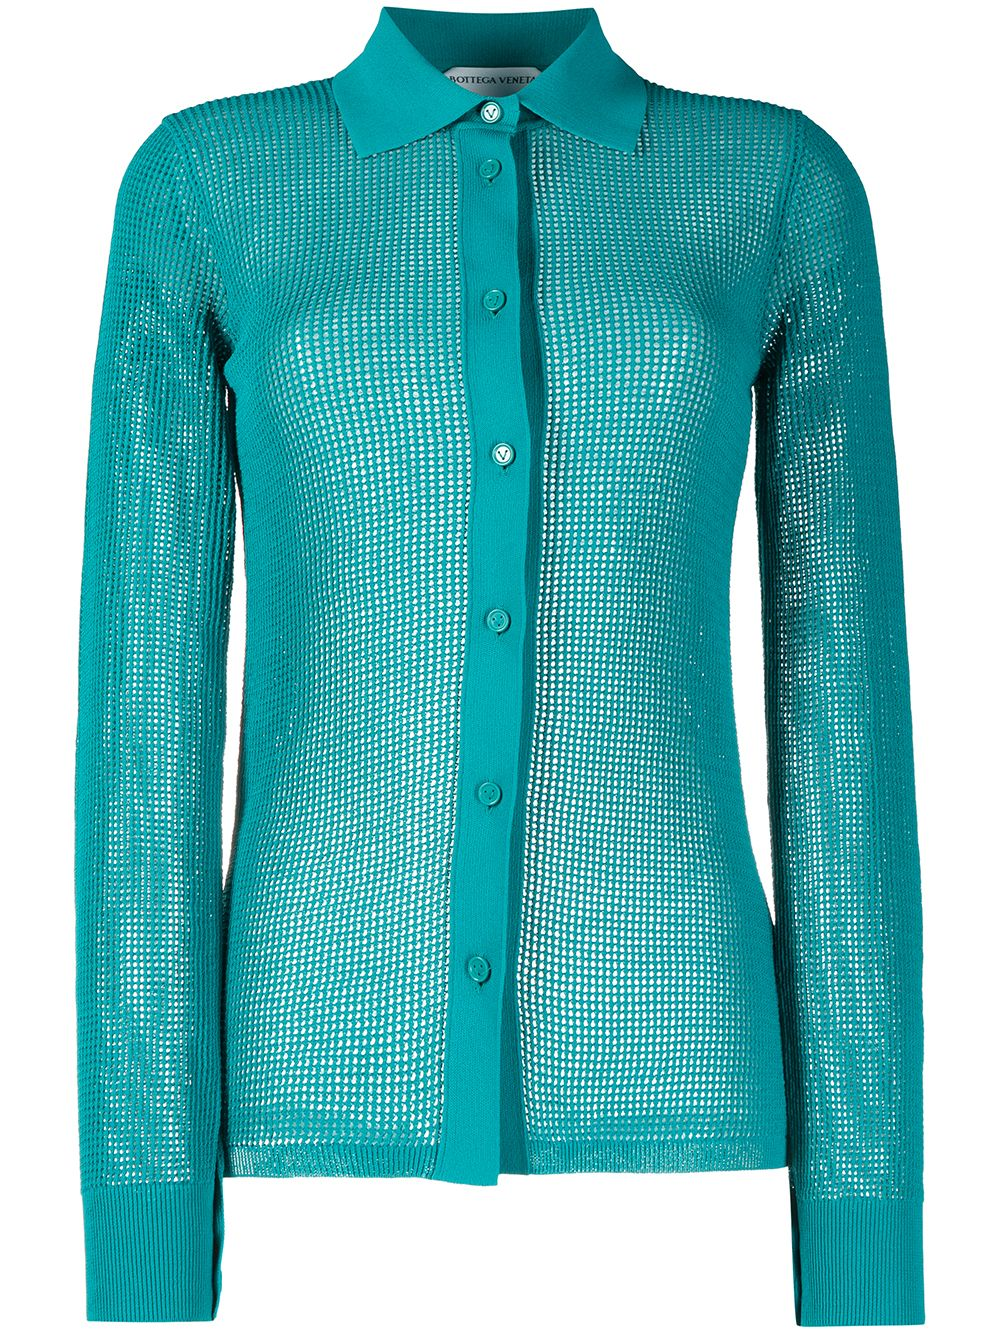 Petrol blue crystal-embellished shirt  BOTTEGA VENETA |  | 648977-V0BN03103